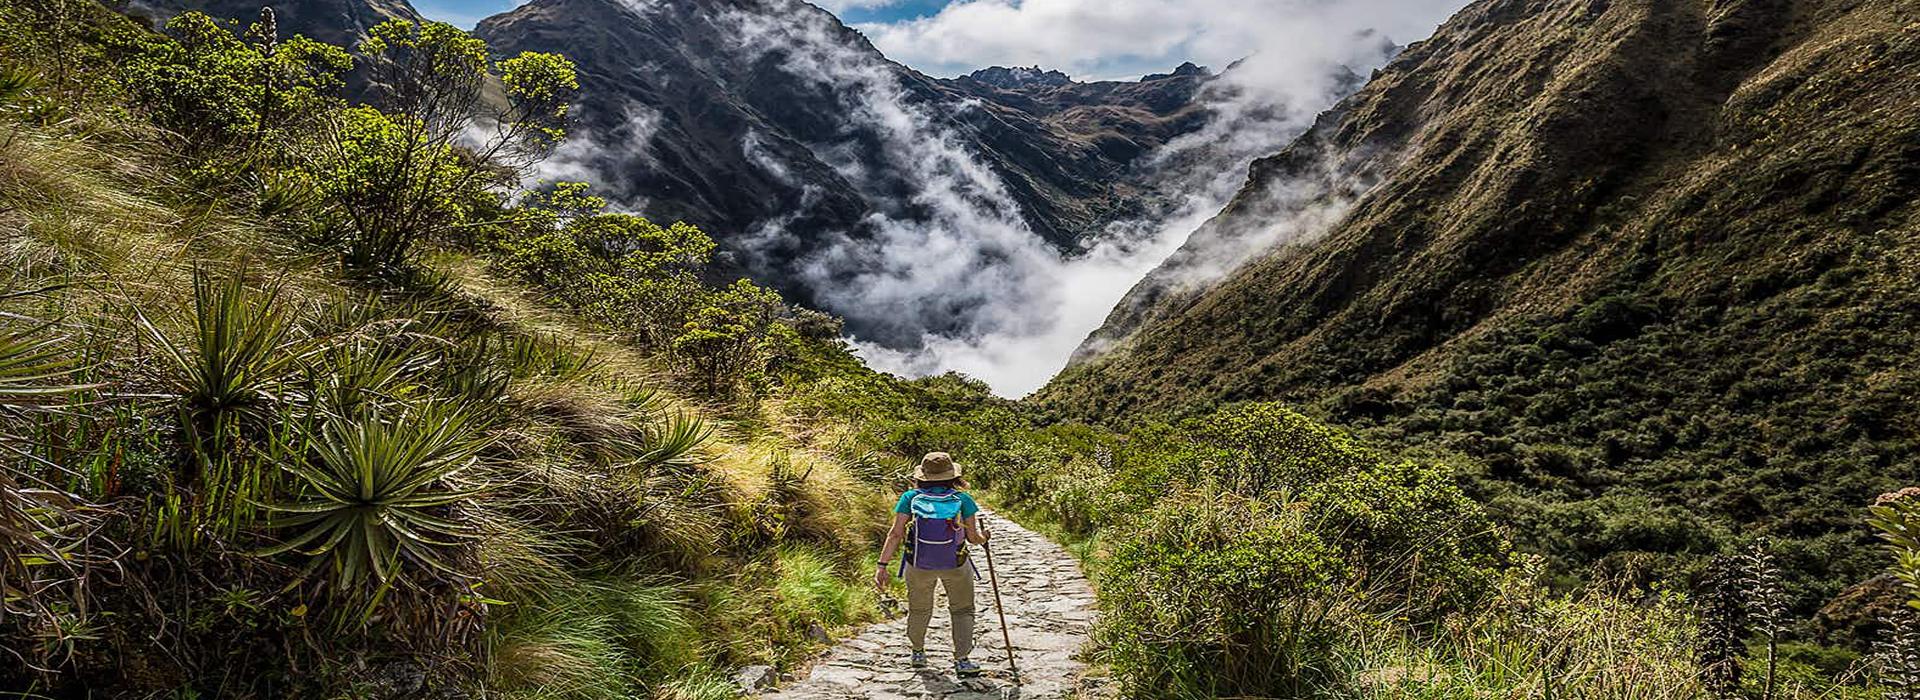 Inka Trail Original 2 days / 1 night